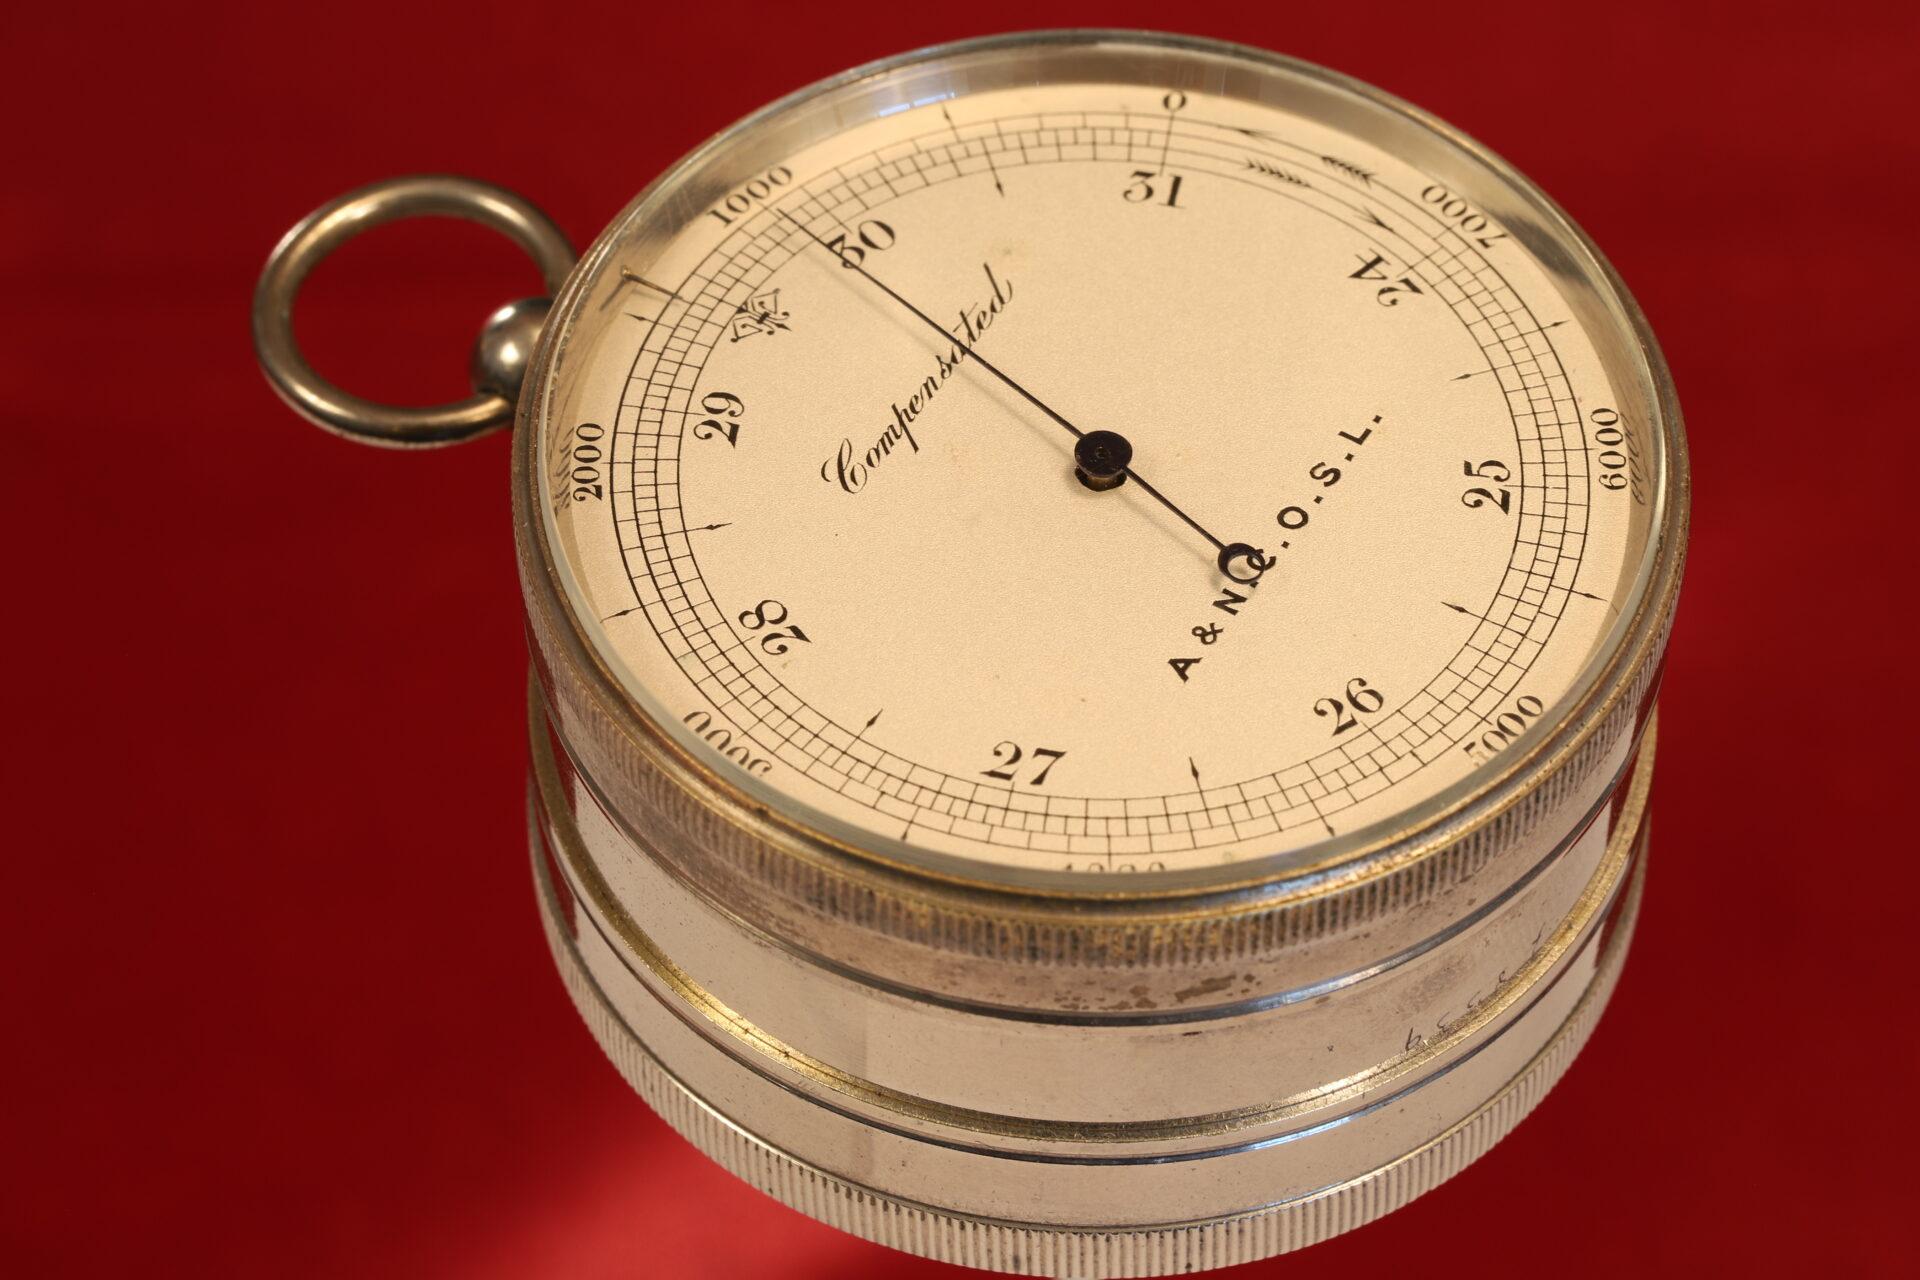 Image of Army & Navy COSL Pocket Barometer Compendium c1880 showing pocket barometer from side